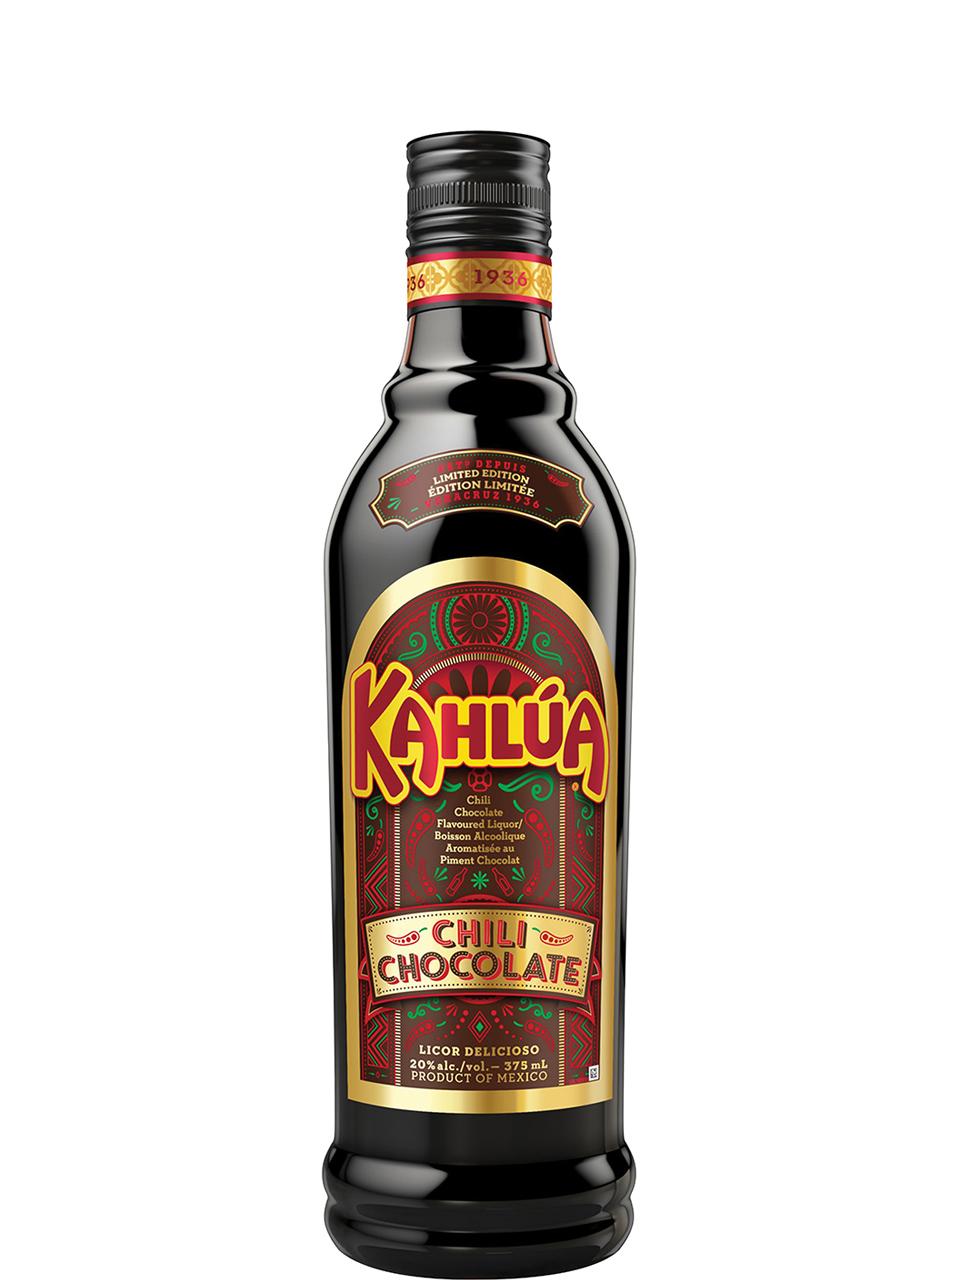 Kahlua Chili Chocolate Limited Edition Liqueur